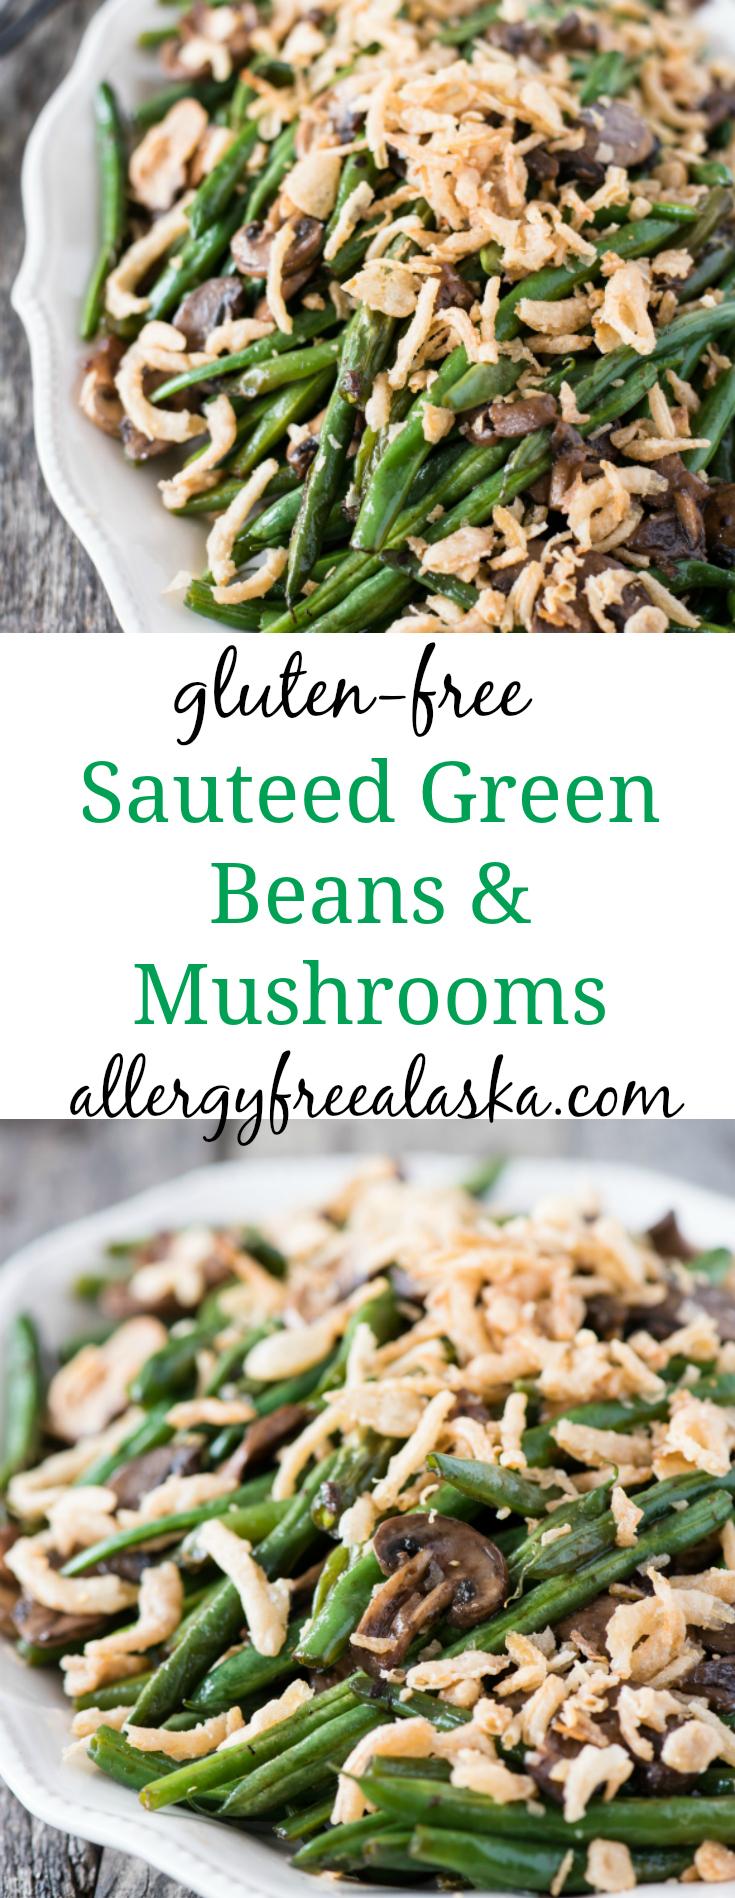 Gluten Free Sautéed Green Beans and Mushrooms